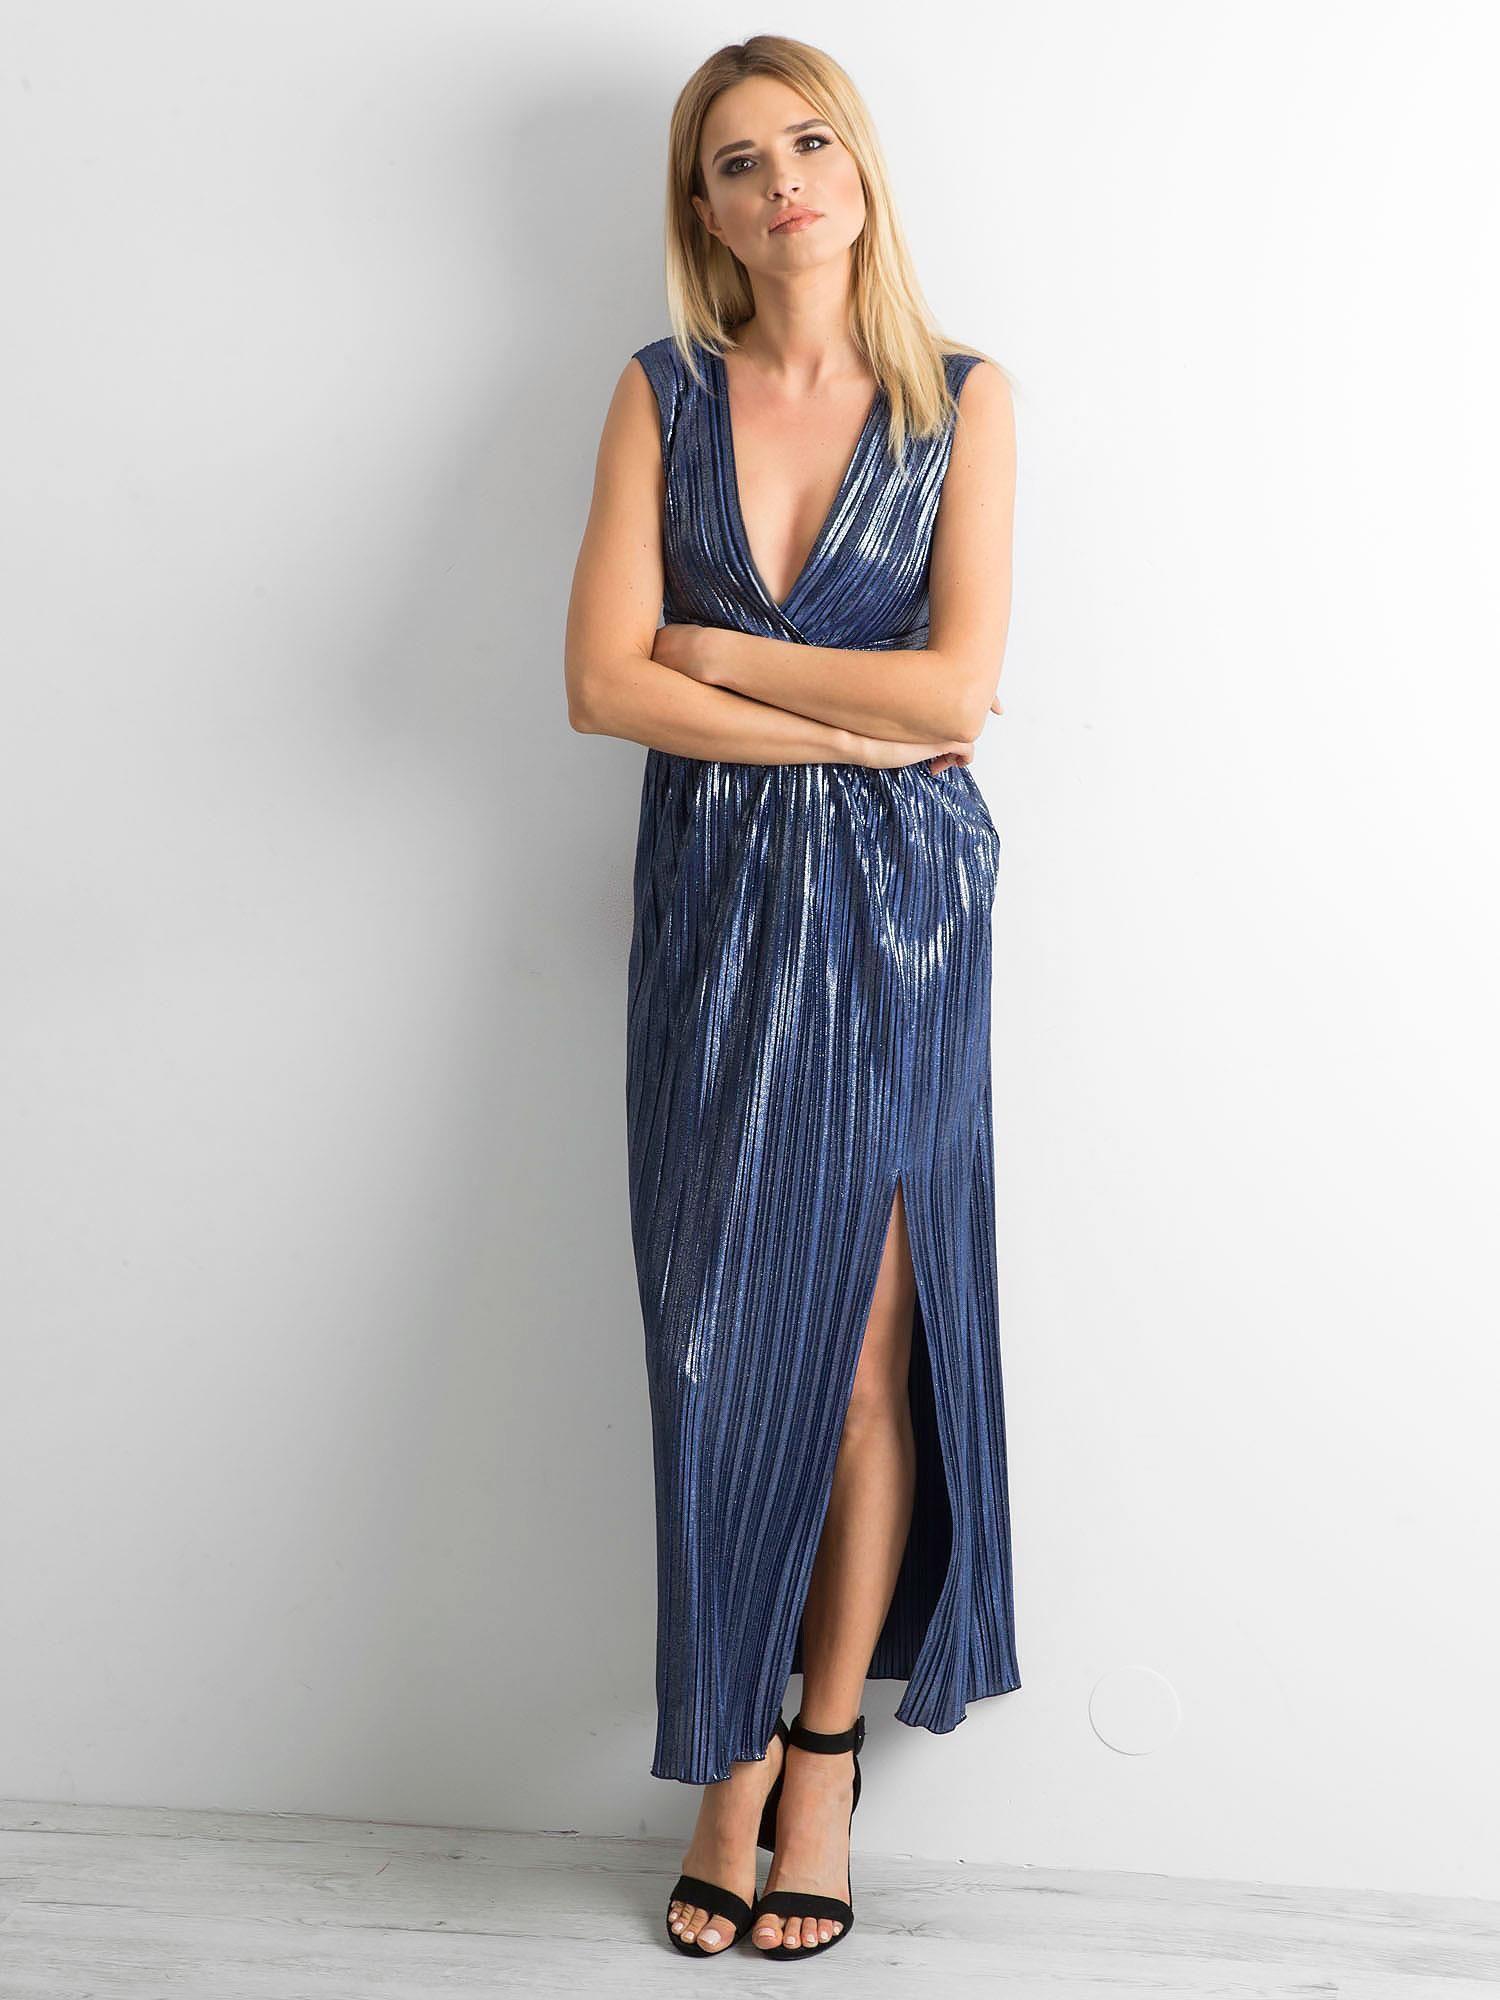 2ff606de41 Ciemnoniebieska plisowana sukienka maxi - Sukienka wieczorowa ...